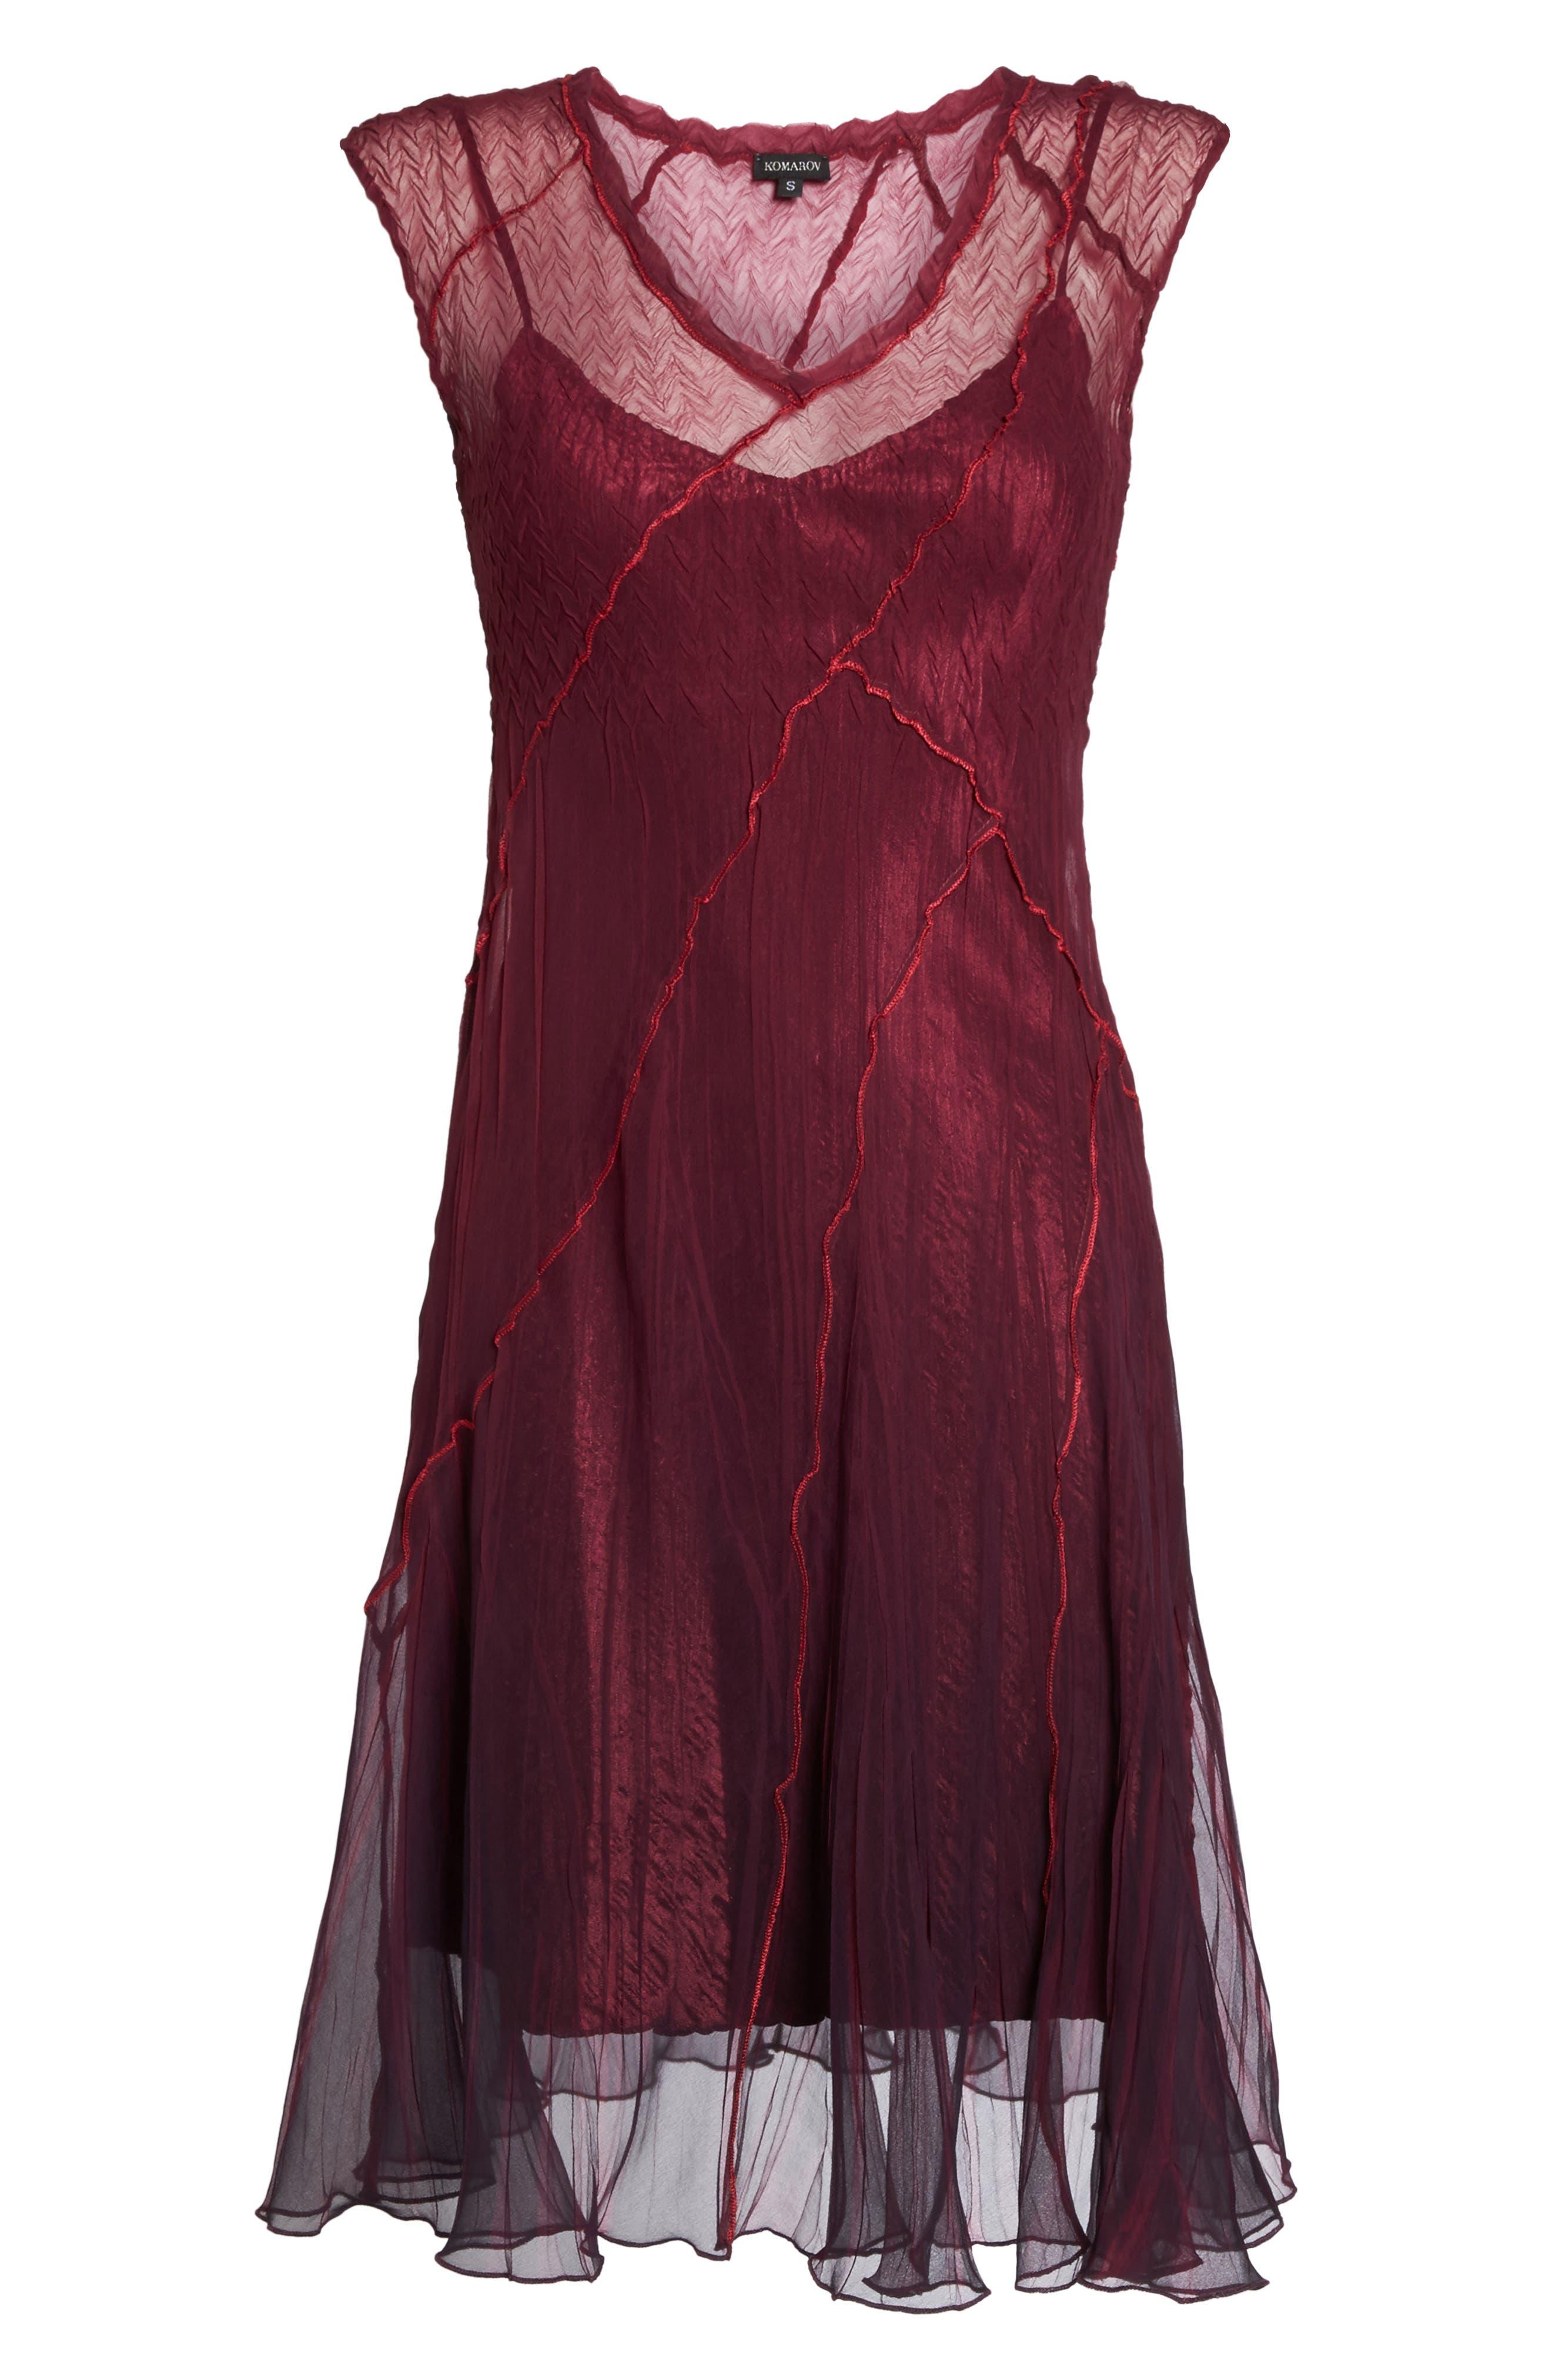 Chiffon A-Line Dress,                             Alternate thumbnail 6, color,                             600